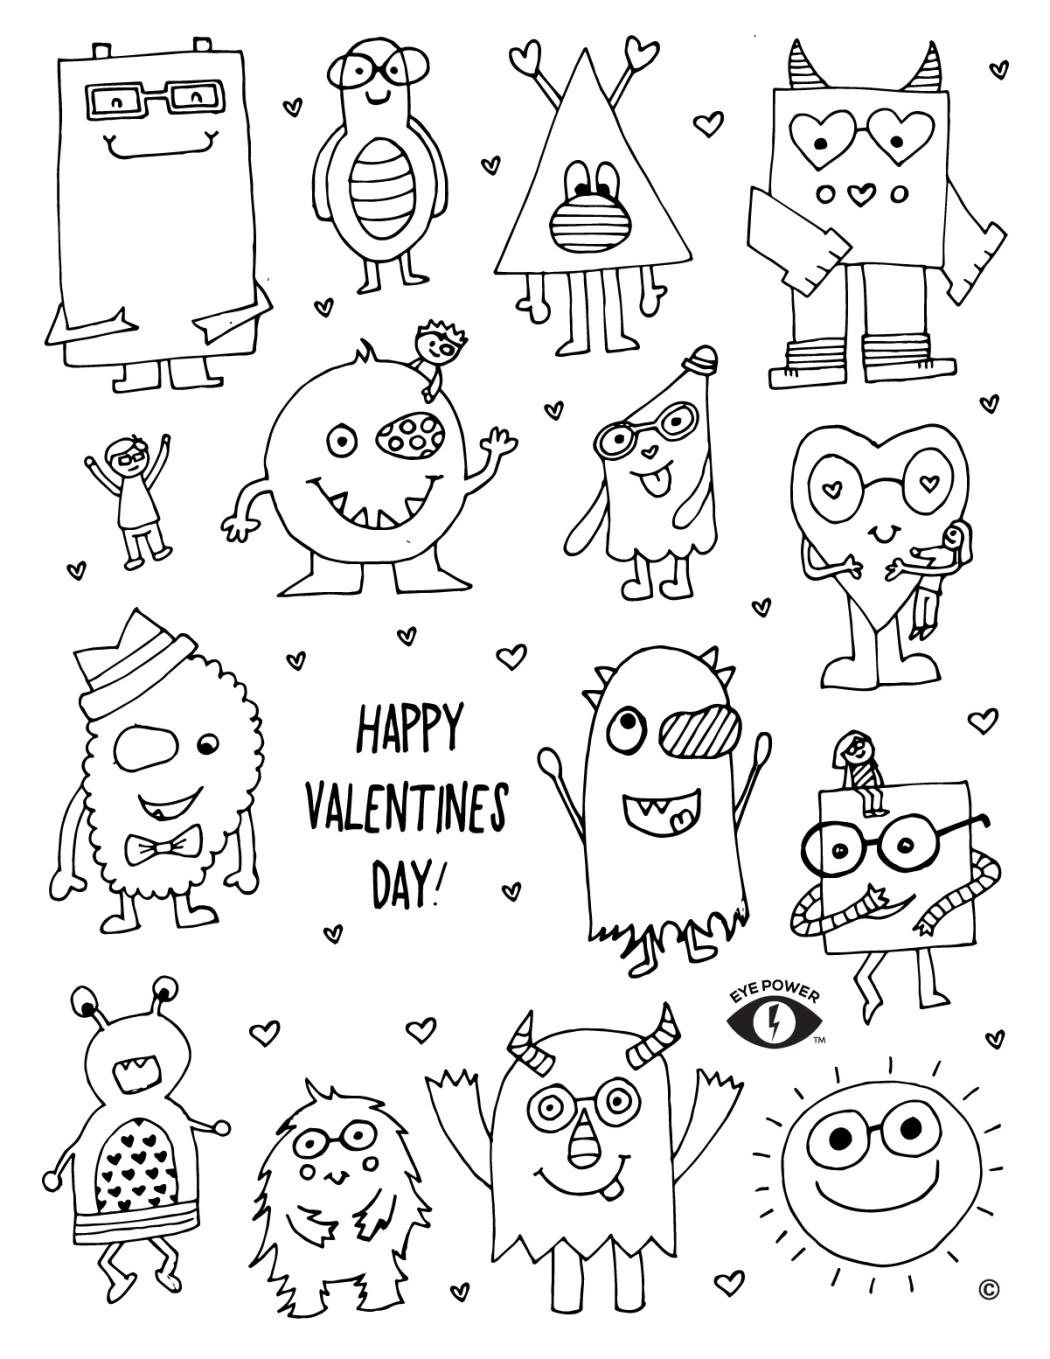 Free Valentines Coloring Page Printable - Eye Power Kids Wear